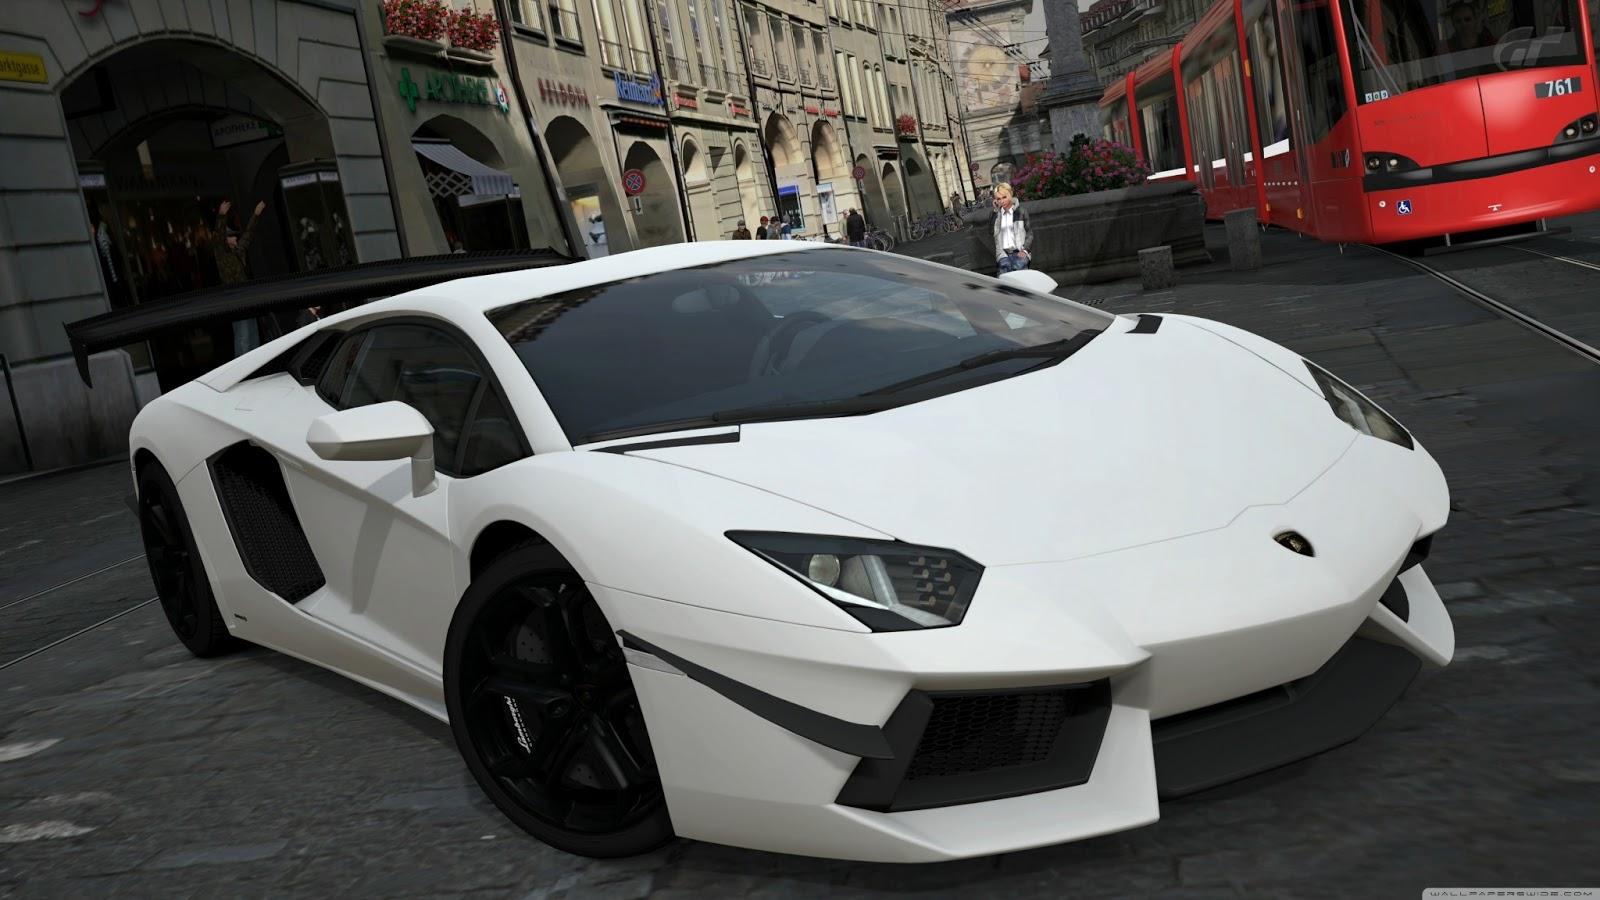 Luxury Lamborghini Cars Lamborghini Aventador Black And White